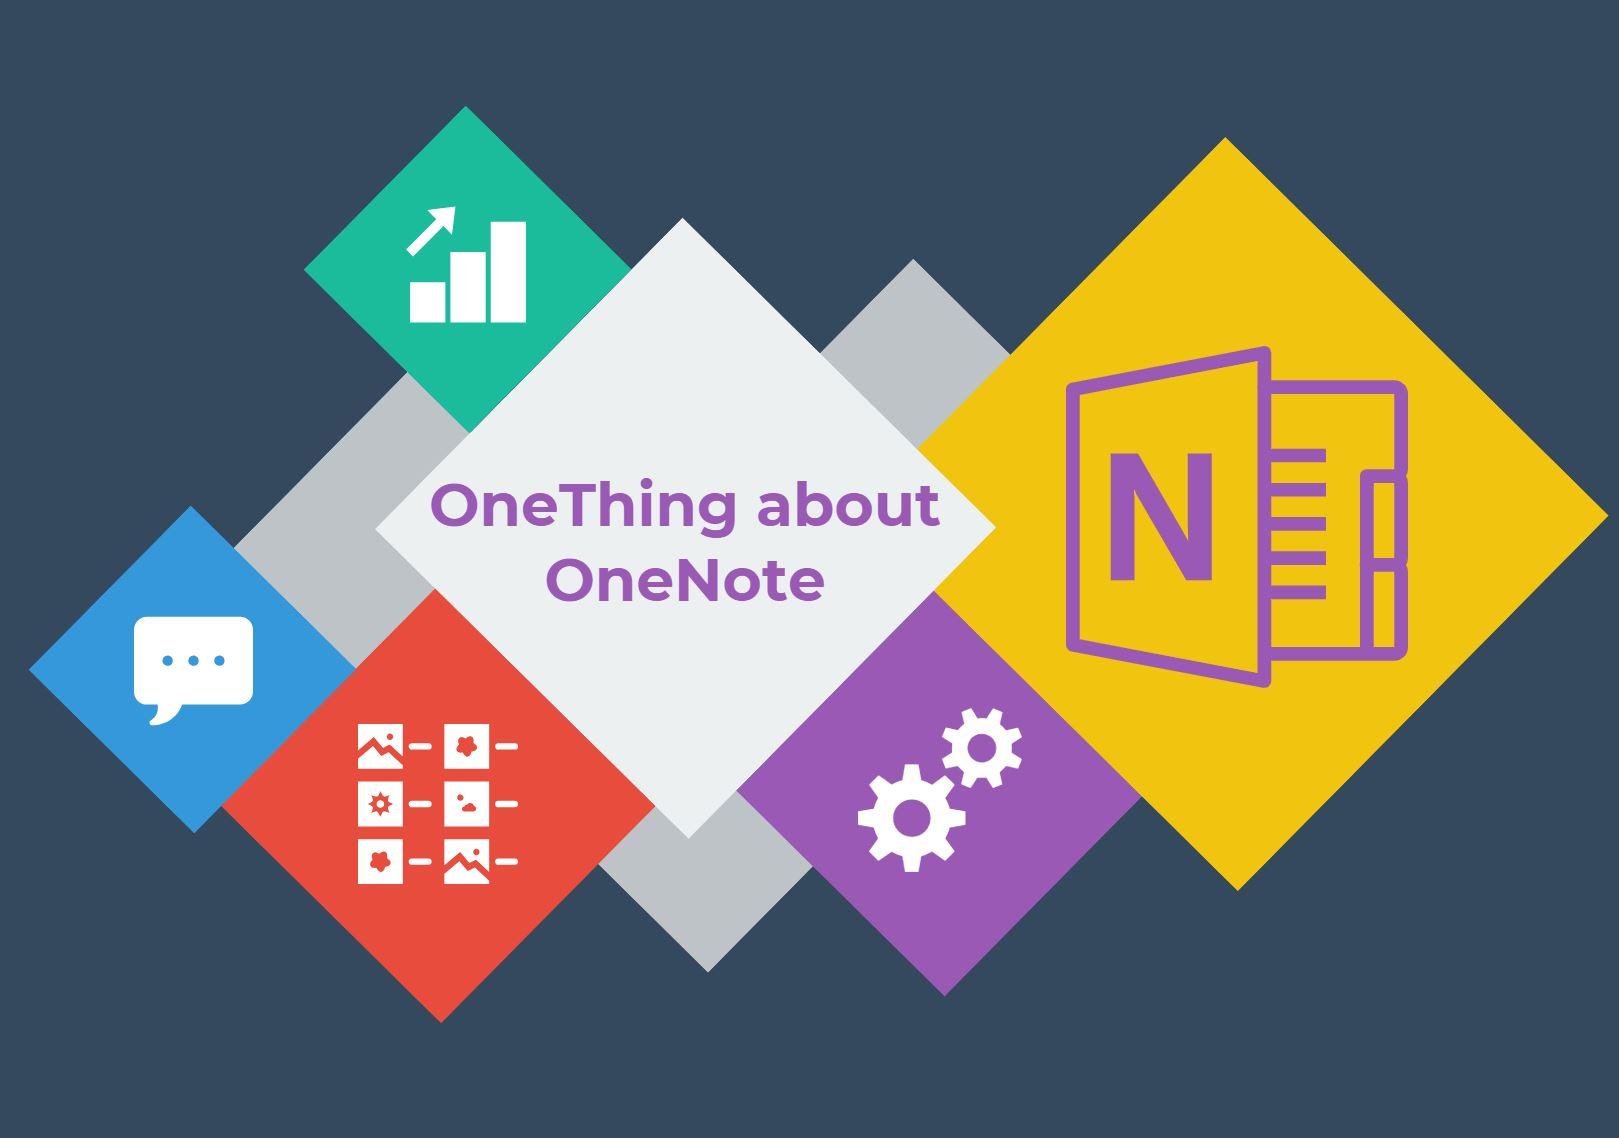 OneNote image